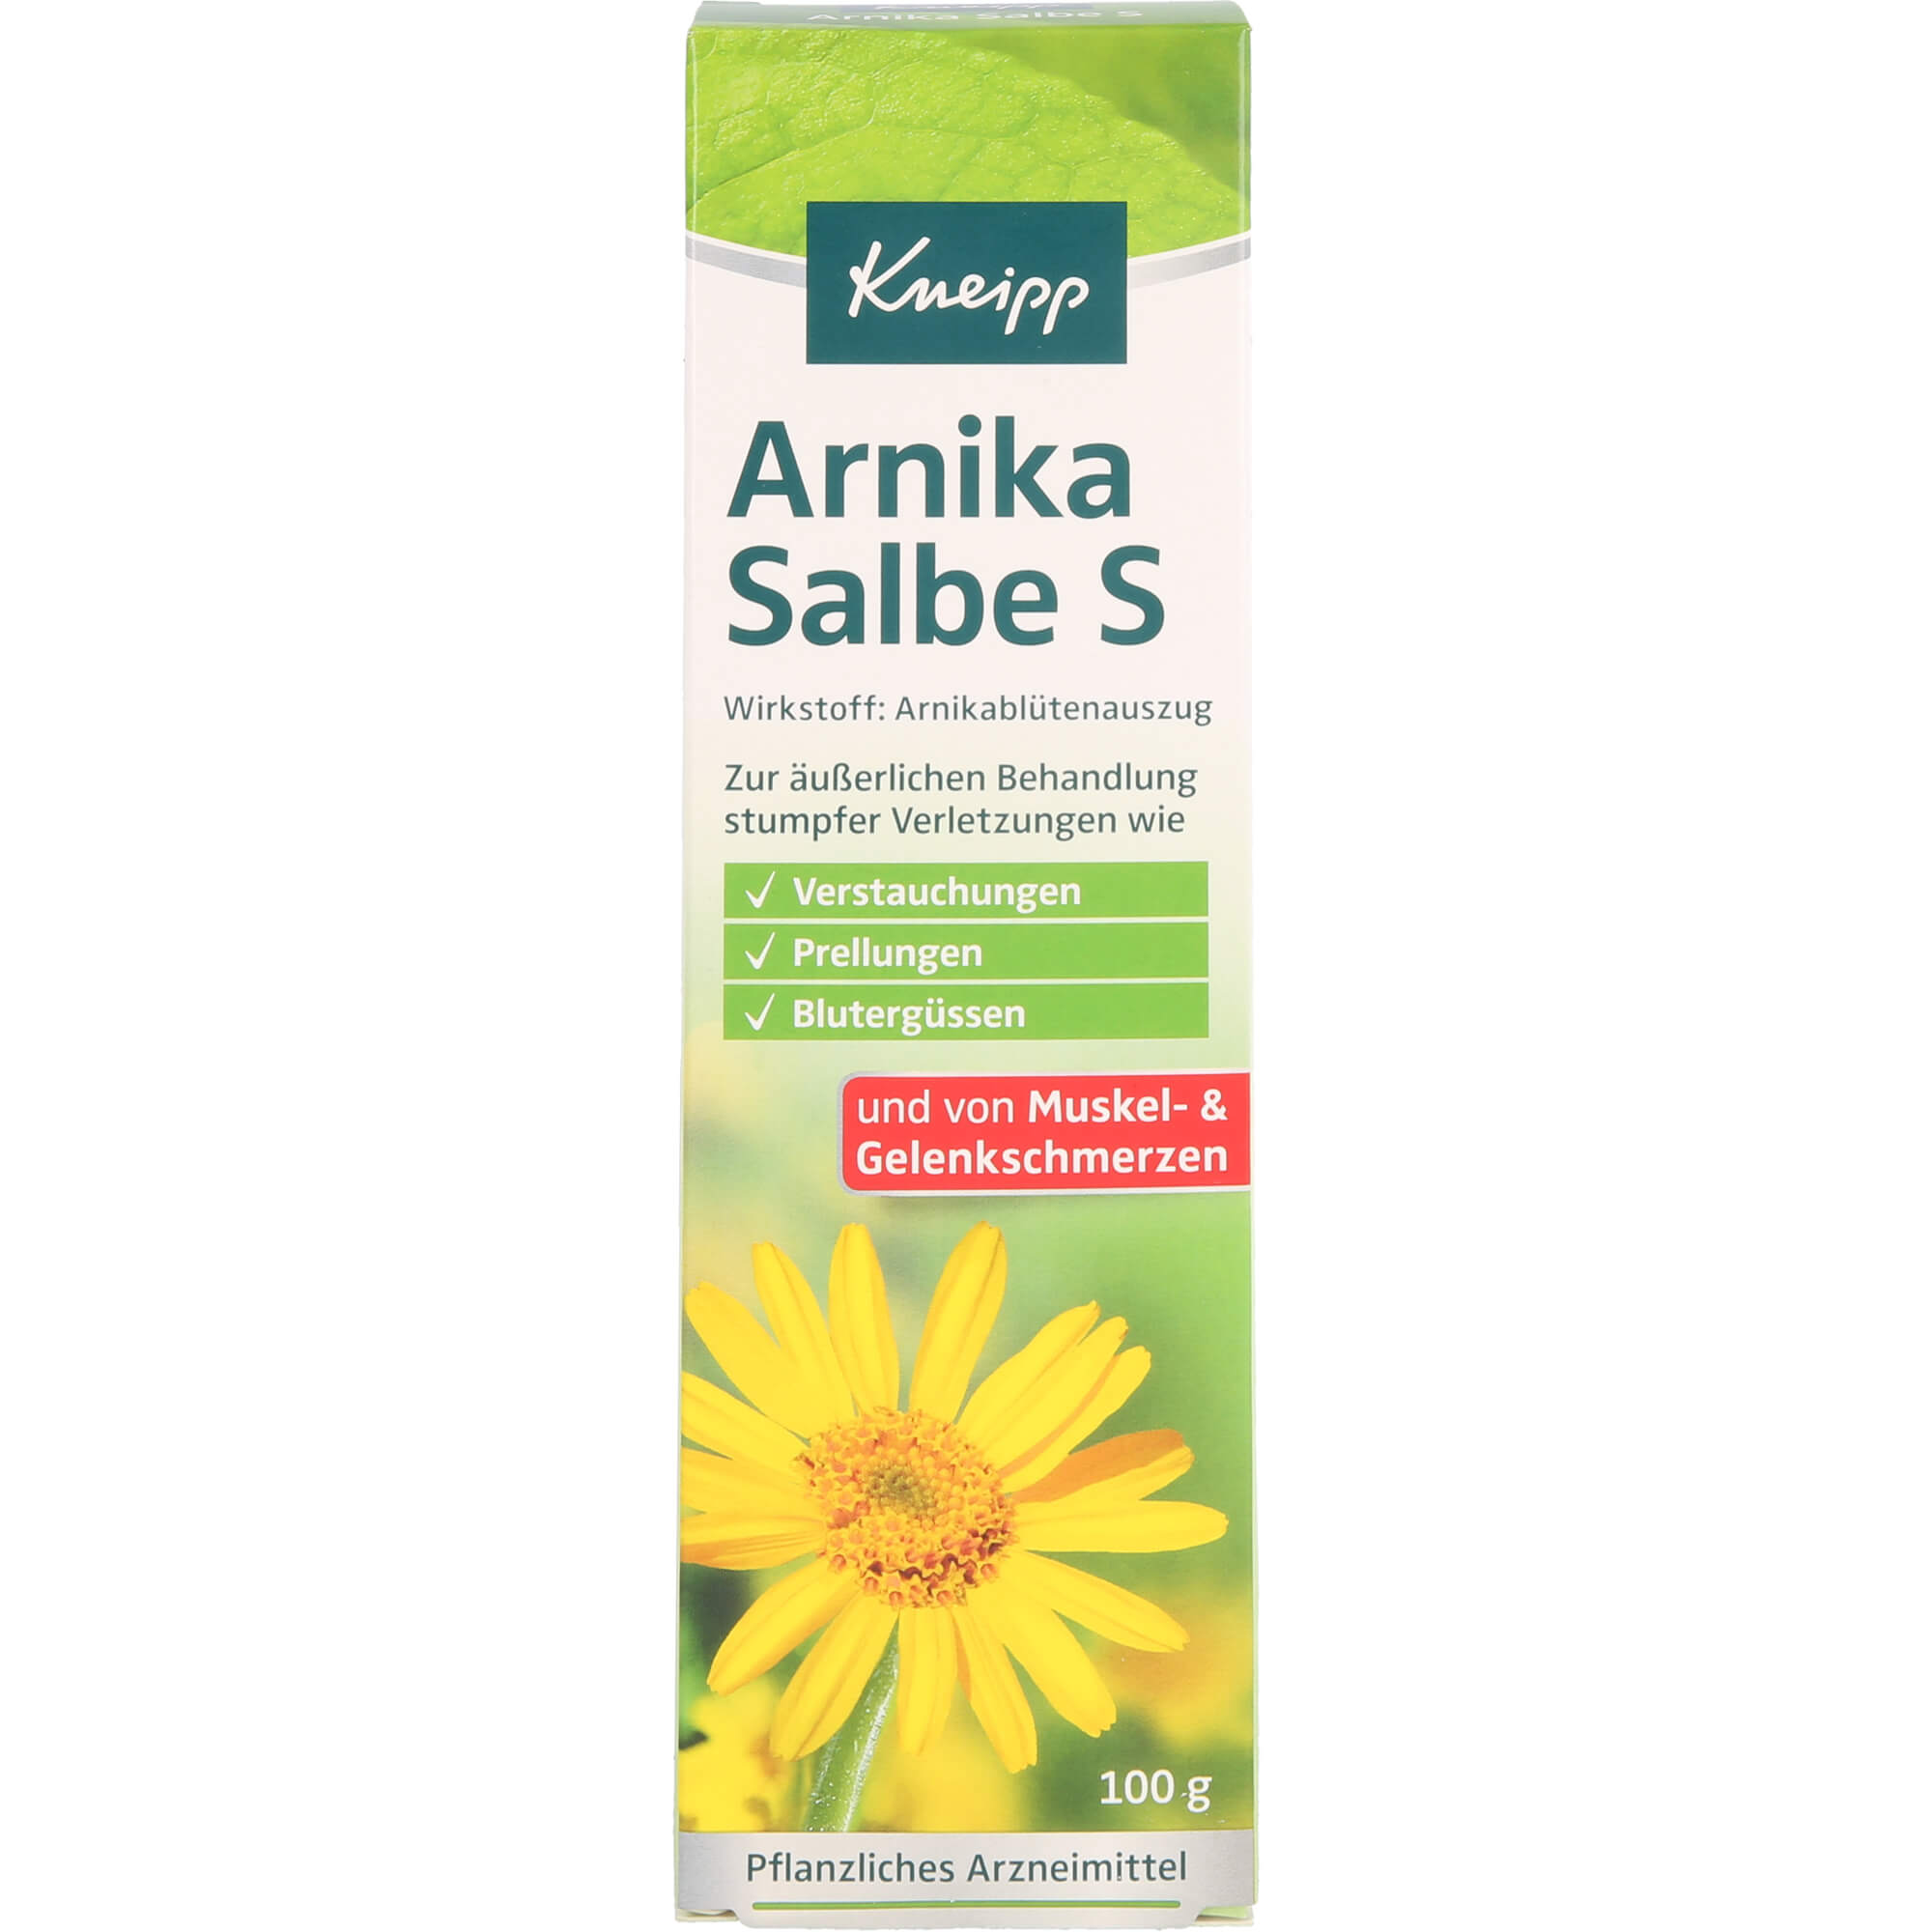 KNEIPP-Arnika-Salbe-S